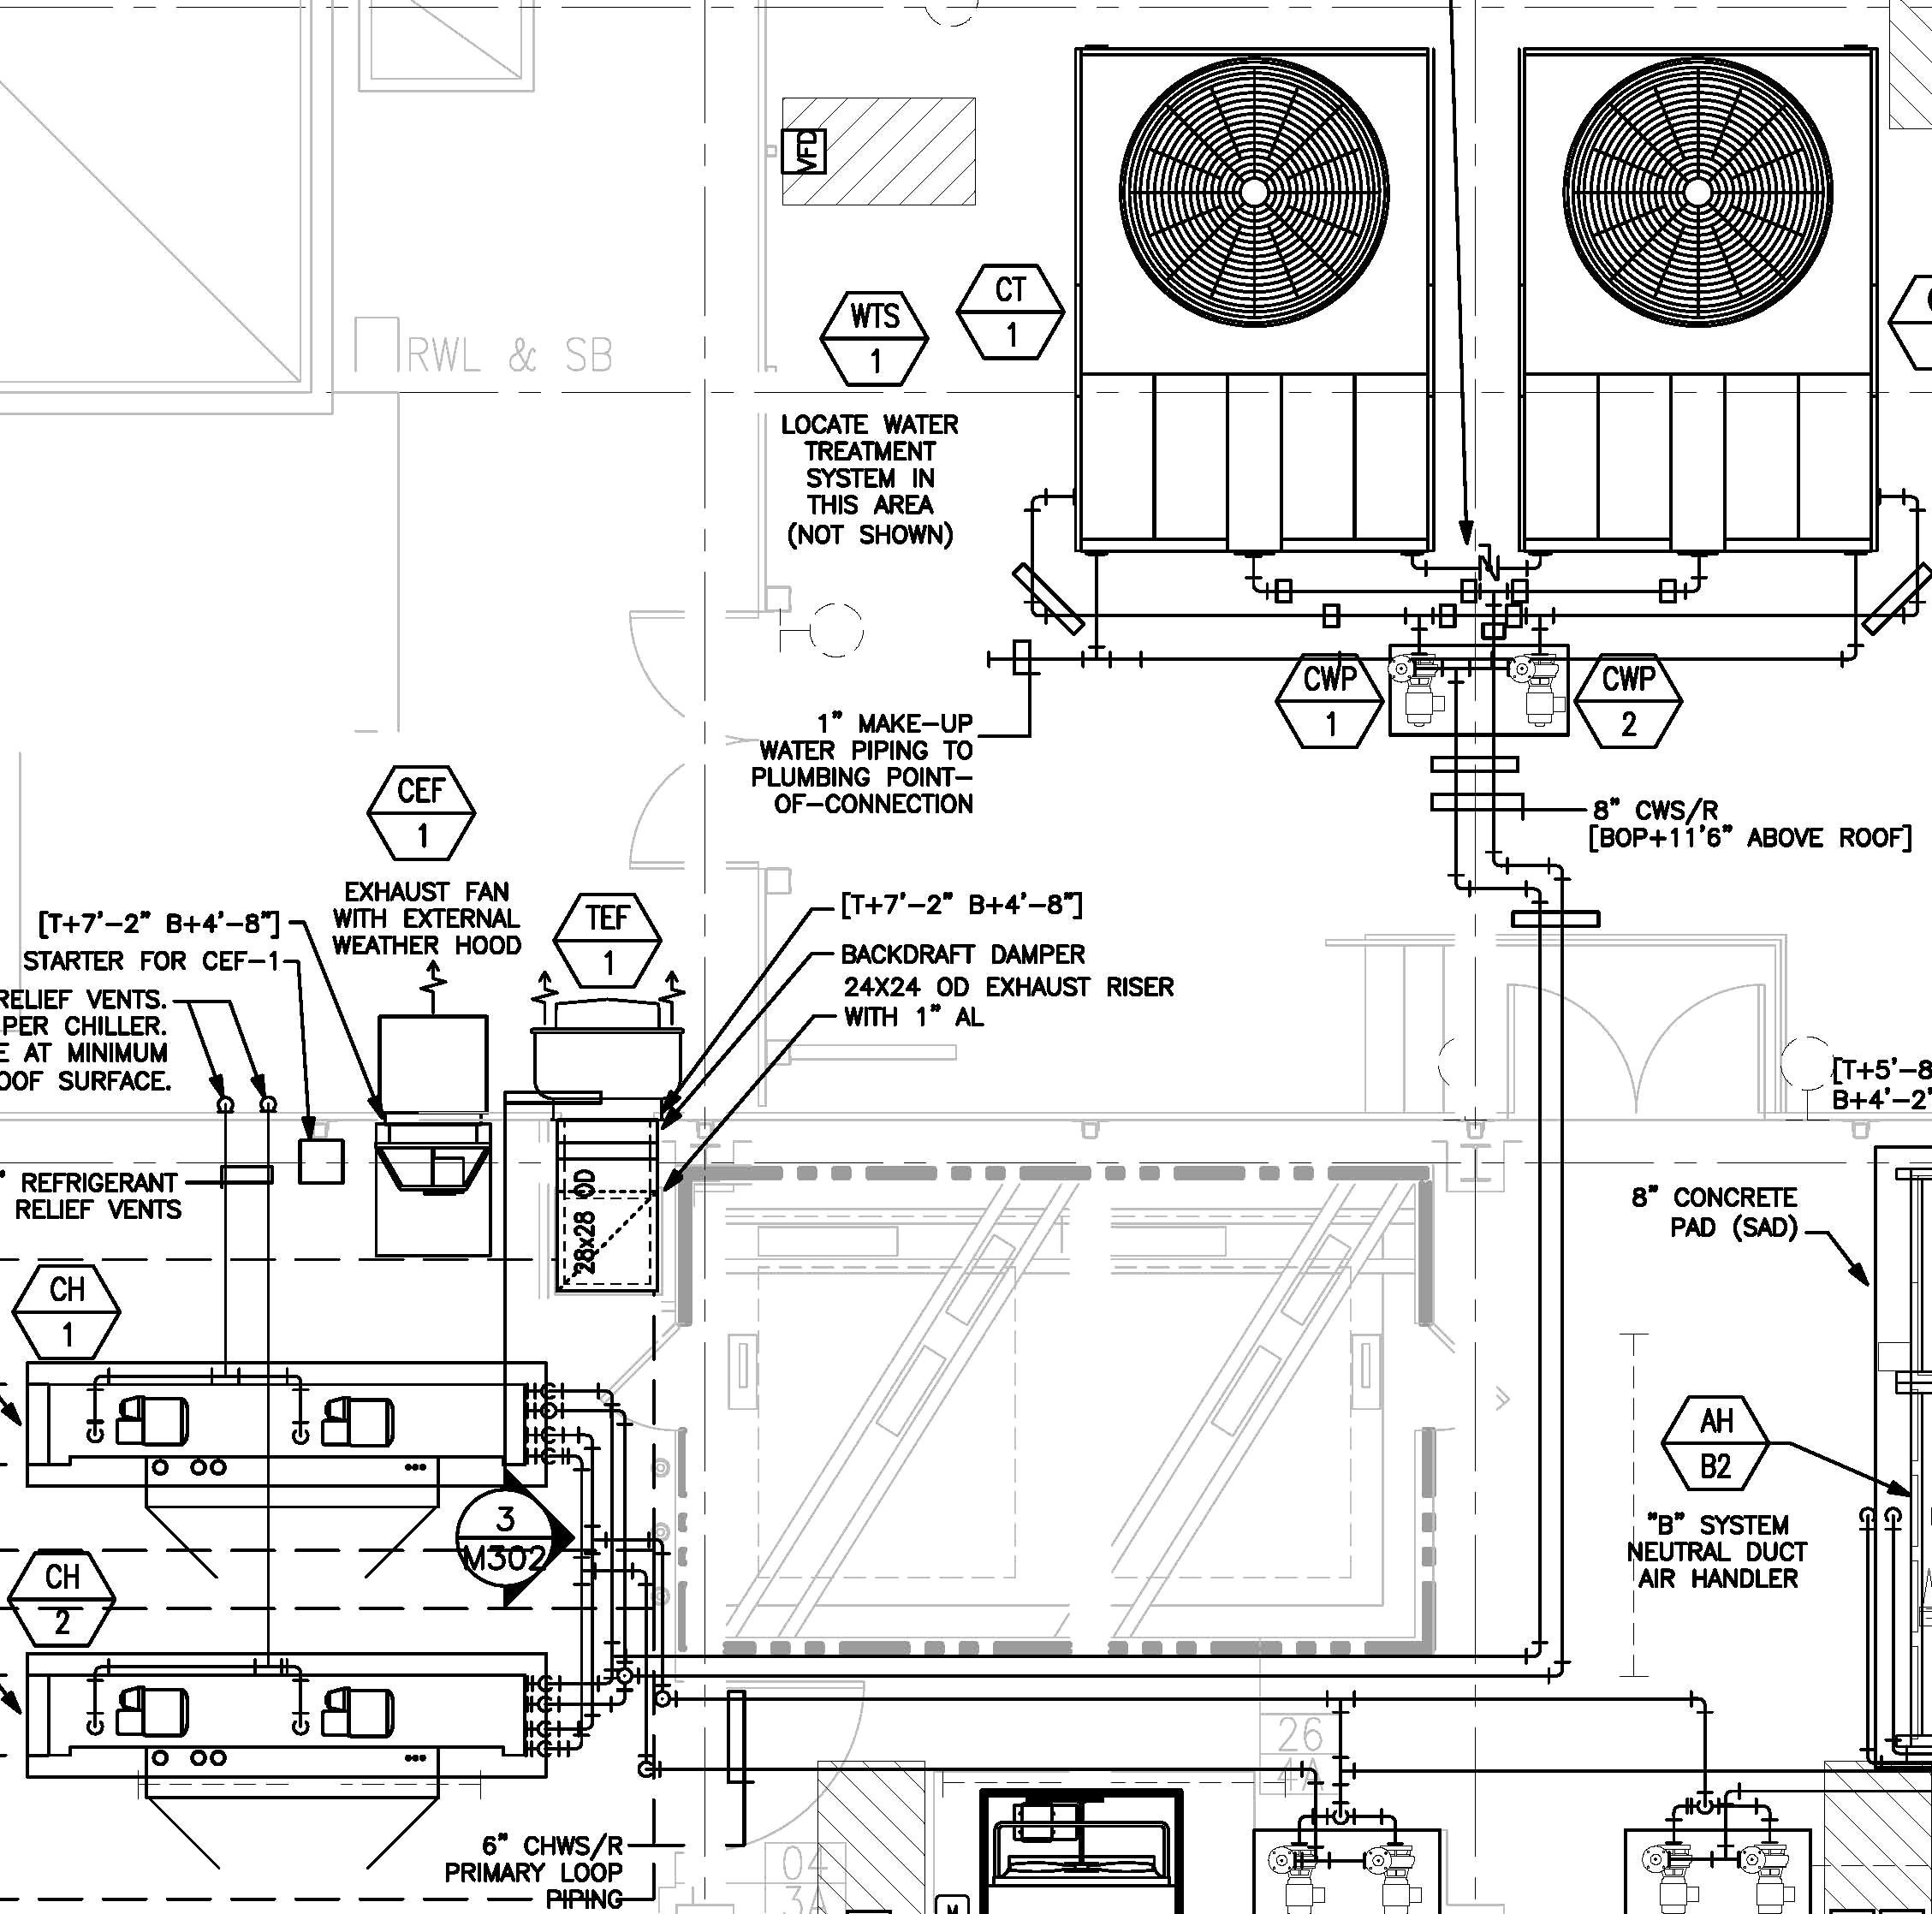 2003 Bmw 325i Engine Diagram Bmw Wiring Diagram System Wiring Schematics Diagram Of 2003 Bmw 325i Engine Diagram